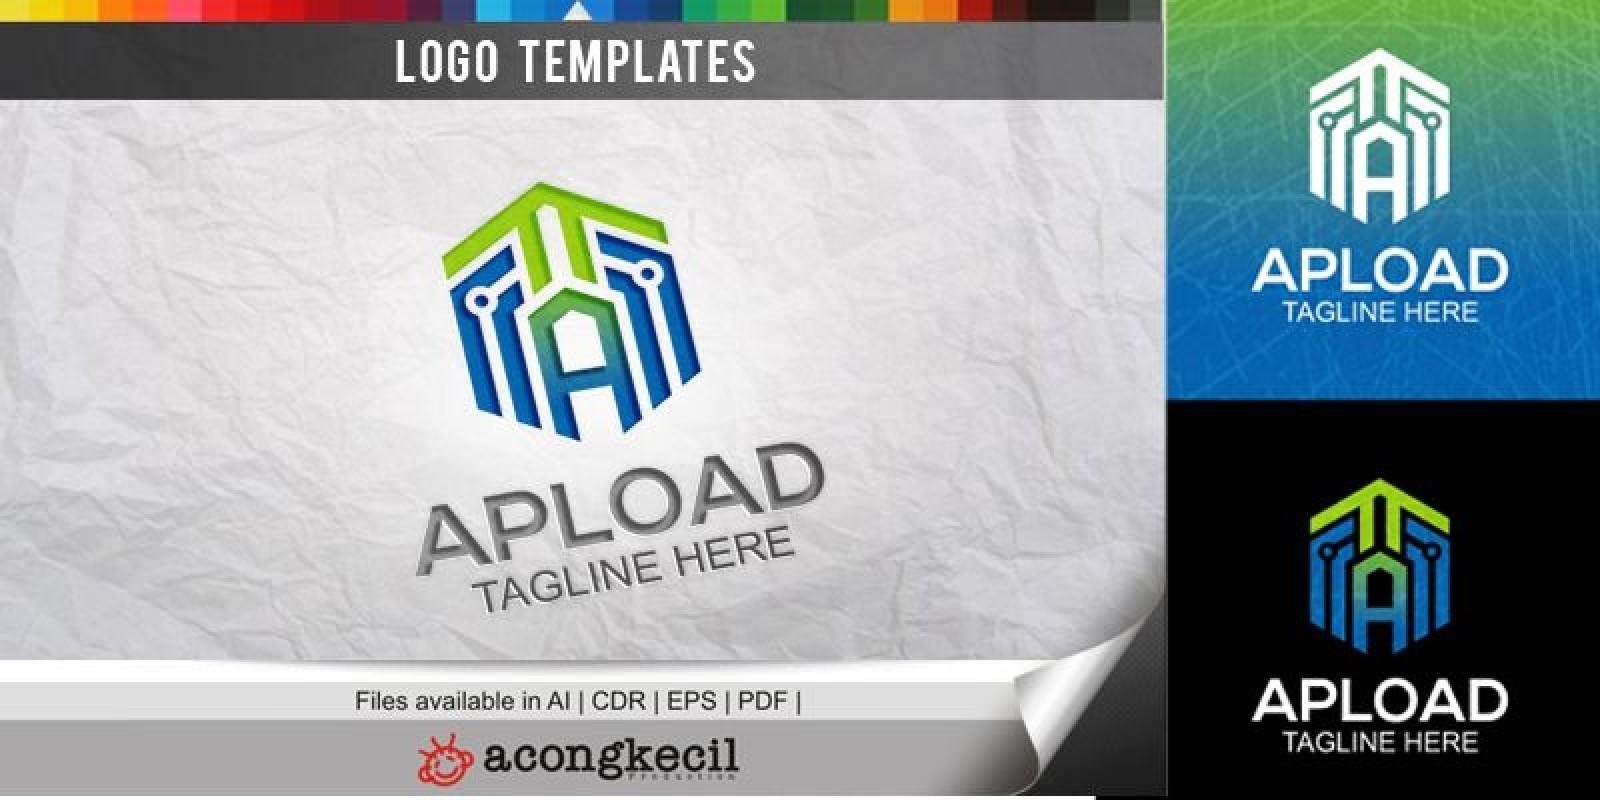 Upload - Logo Template